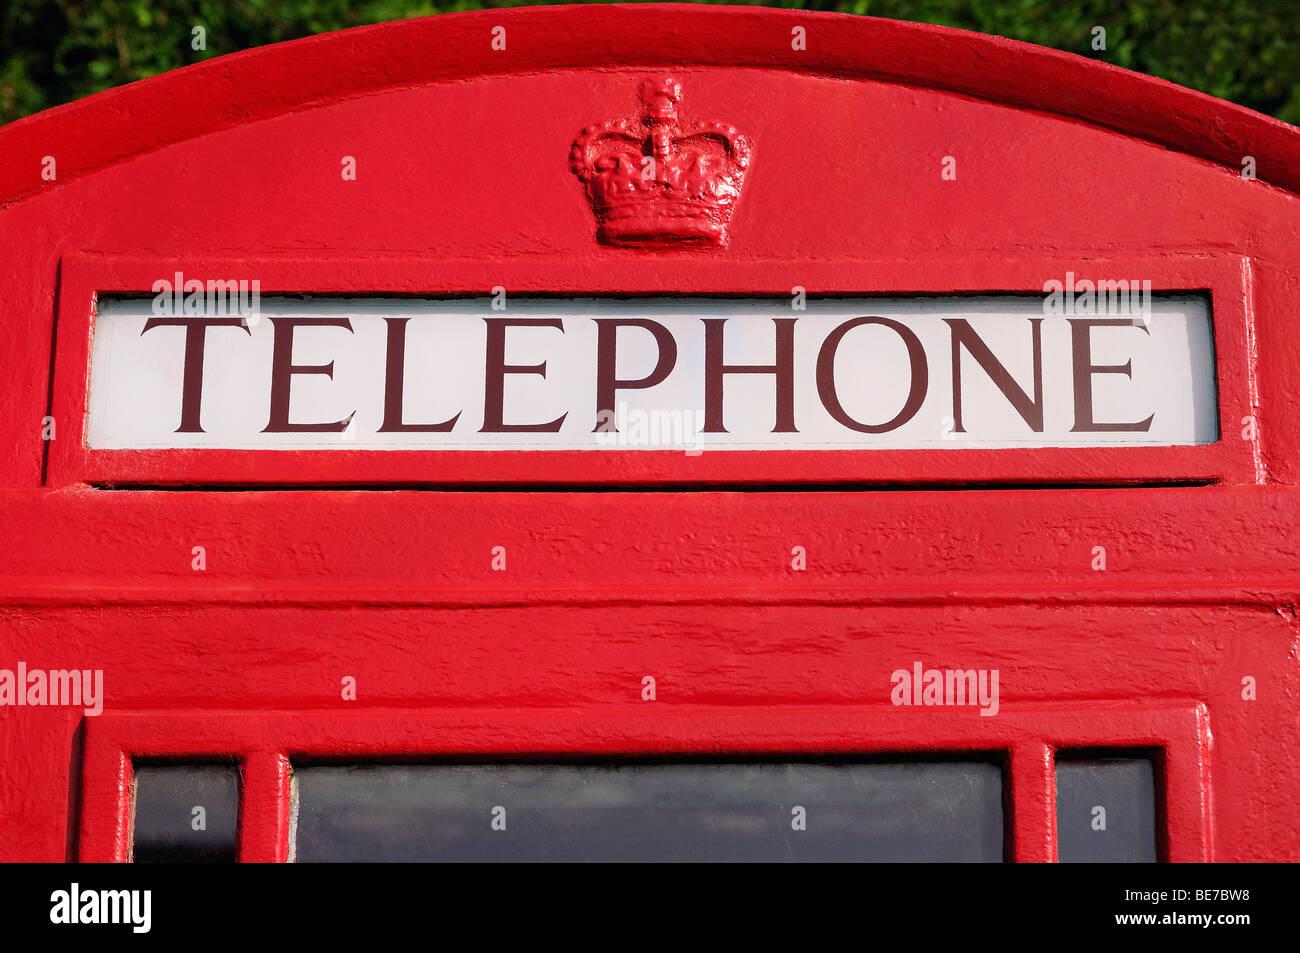 Red Telephone Box, Close Up, United Kingdom. - Stock Image